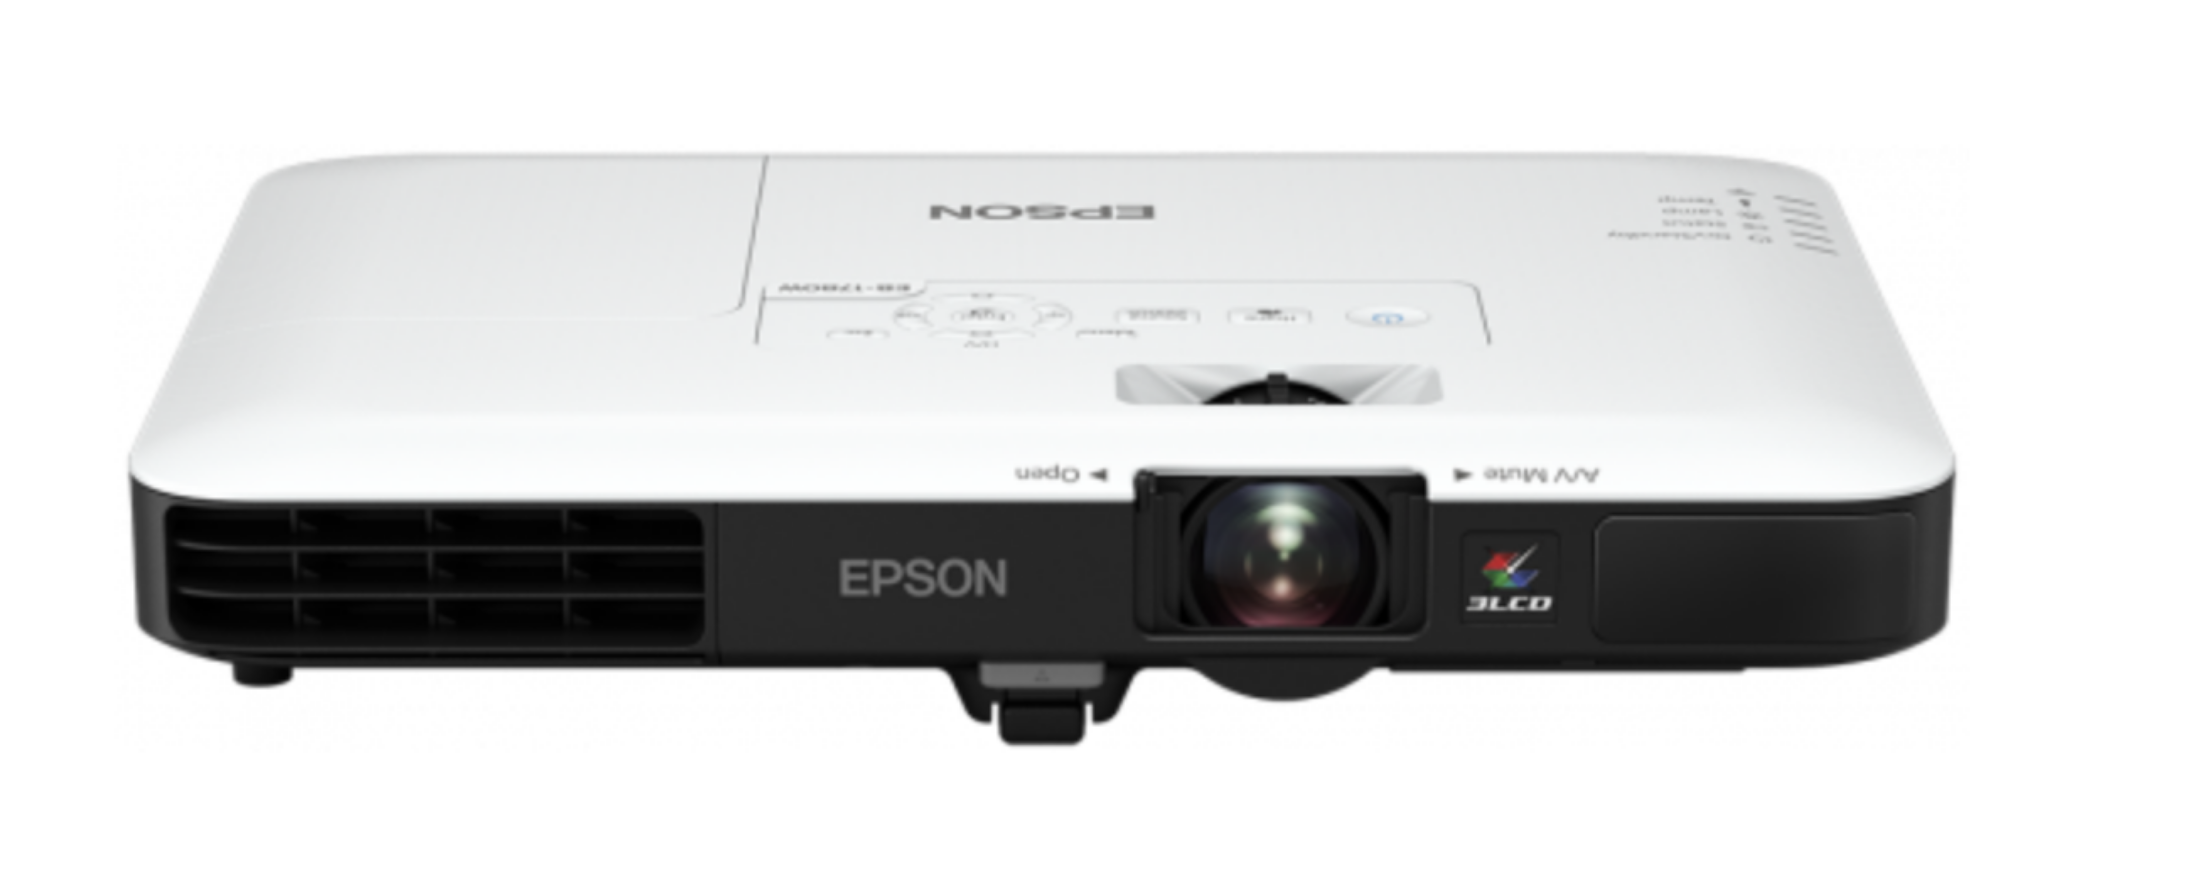 3LCD - 3000 ANSI Lumens - WXGA (1280x800) - 16:10 - HD - 10000:1 - 802.11b/g/n ss fil - ultra-mobile 1.8 kg